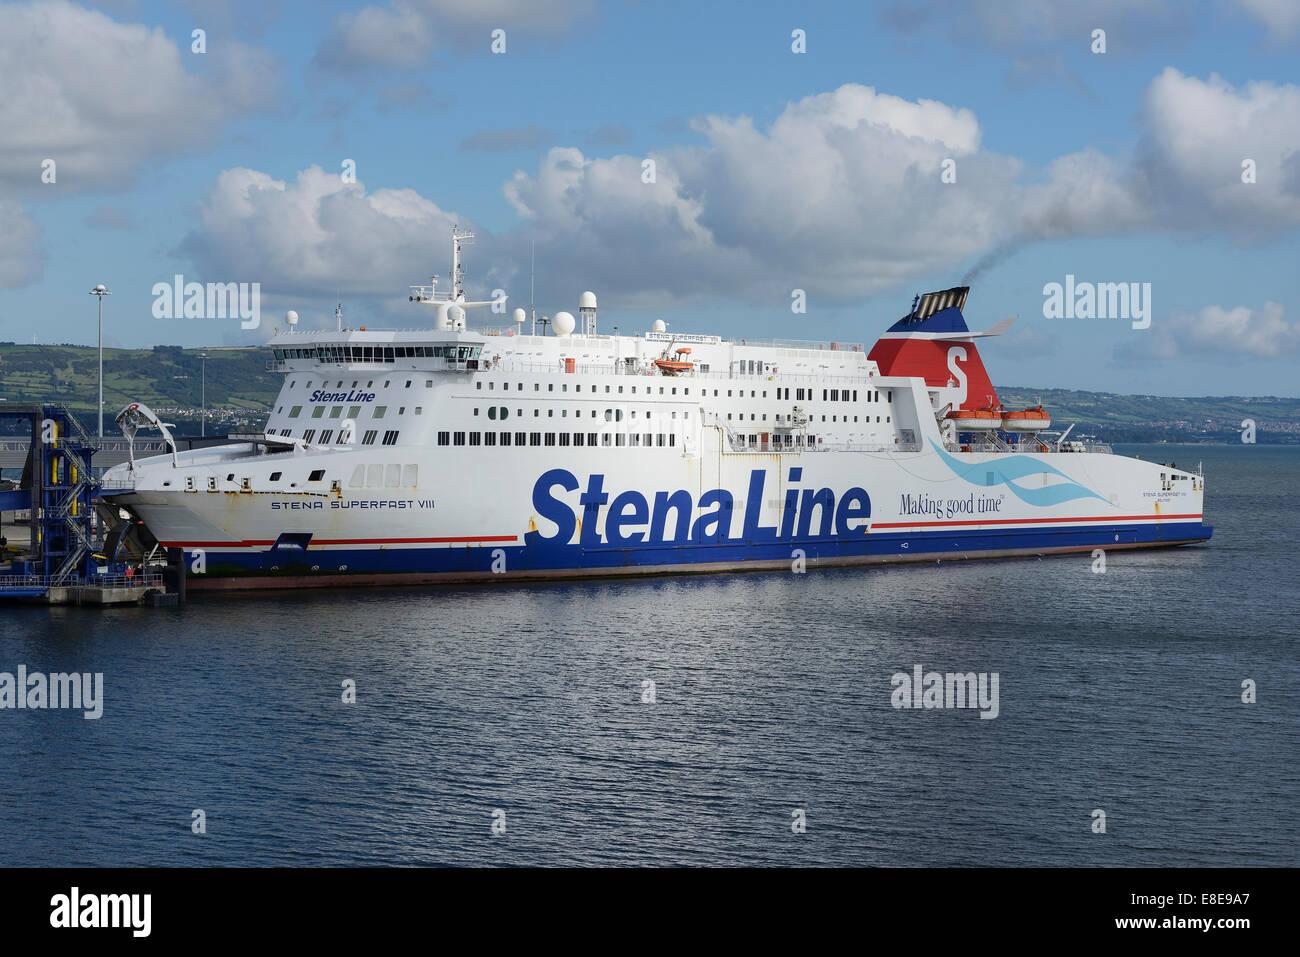 Stena Line Superfast VIII ferry at Belfast Docks UK - Stock Image